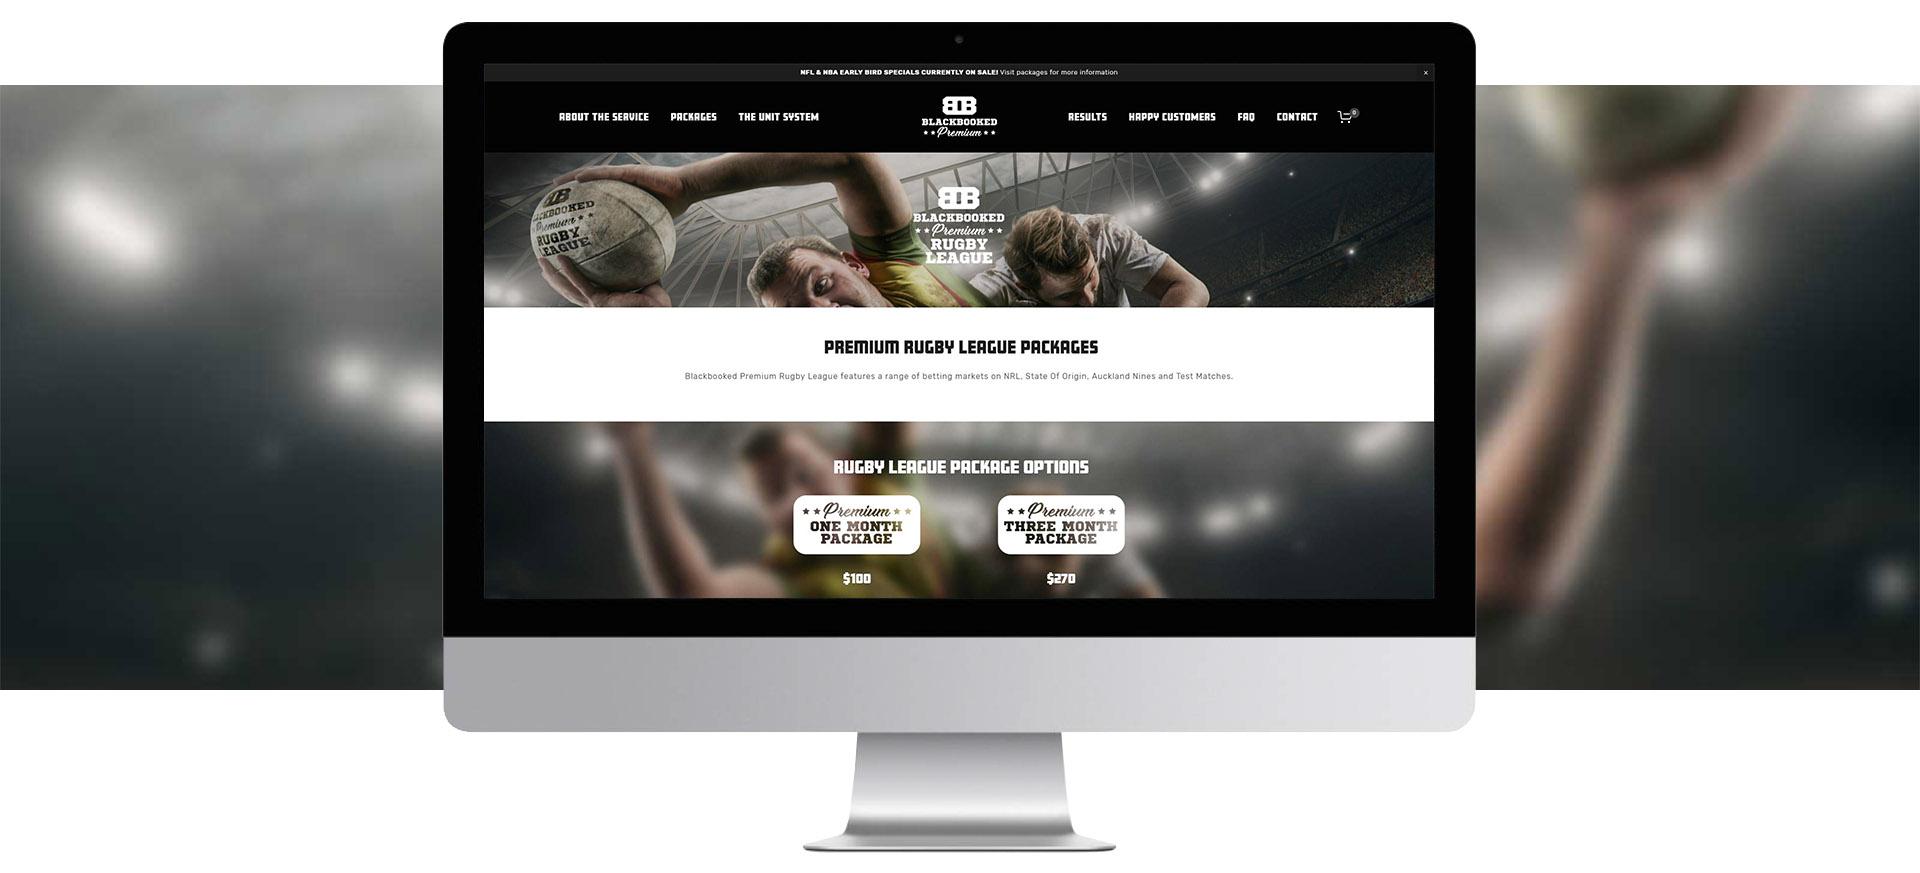 blackbooked premium website image.jpg